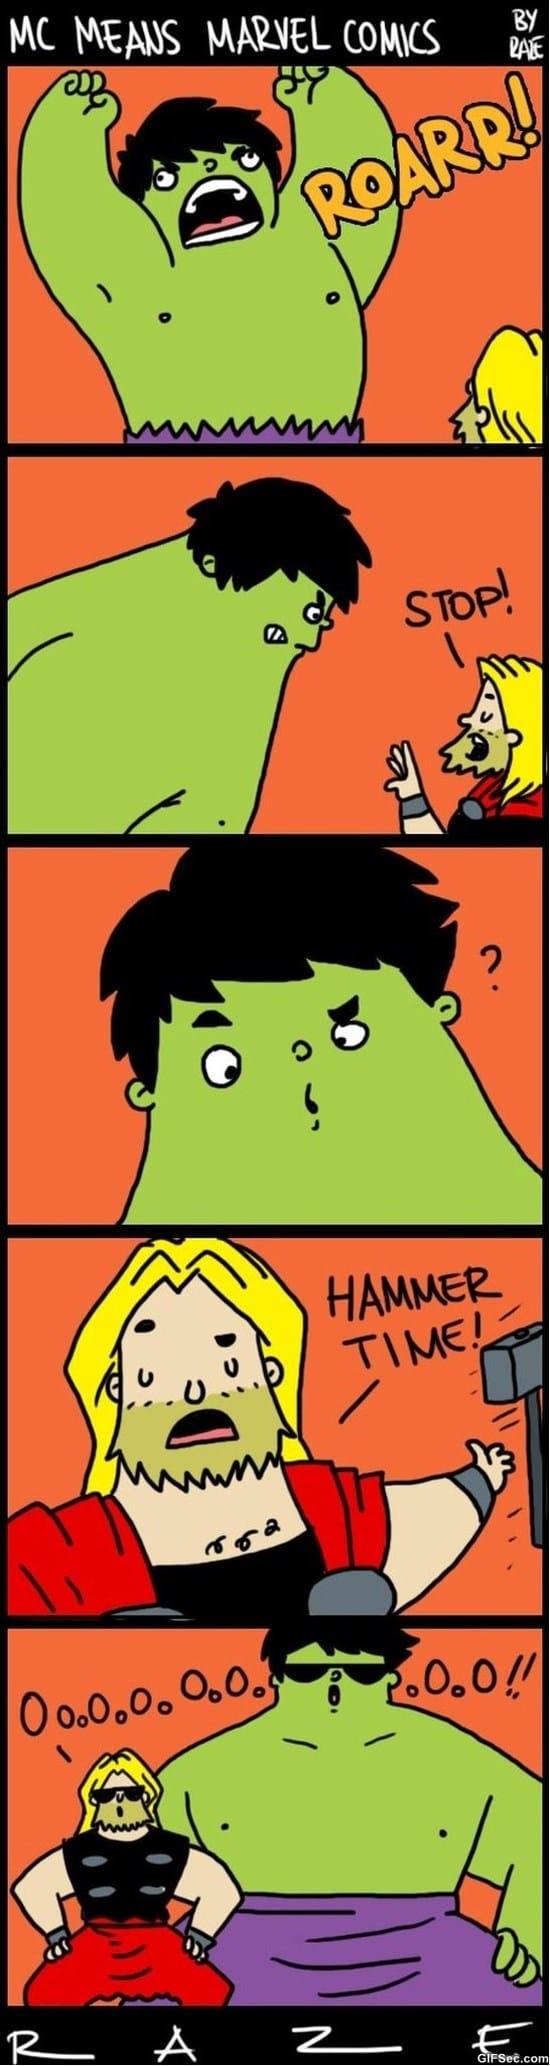 marvel-comics-meme